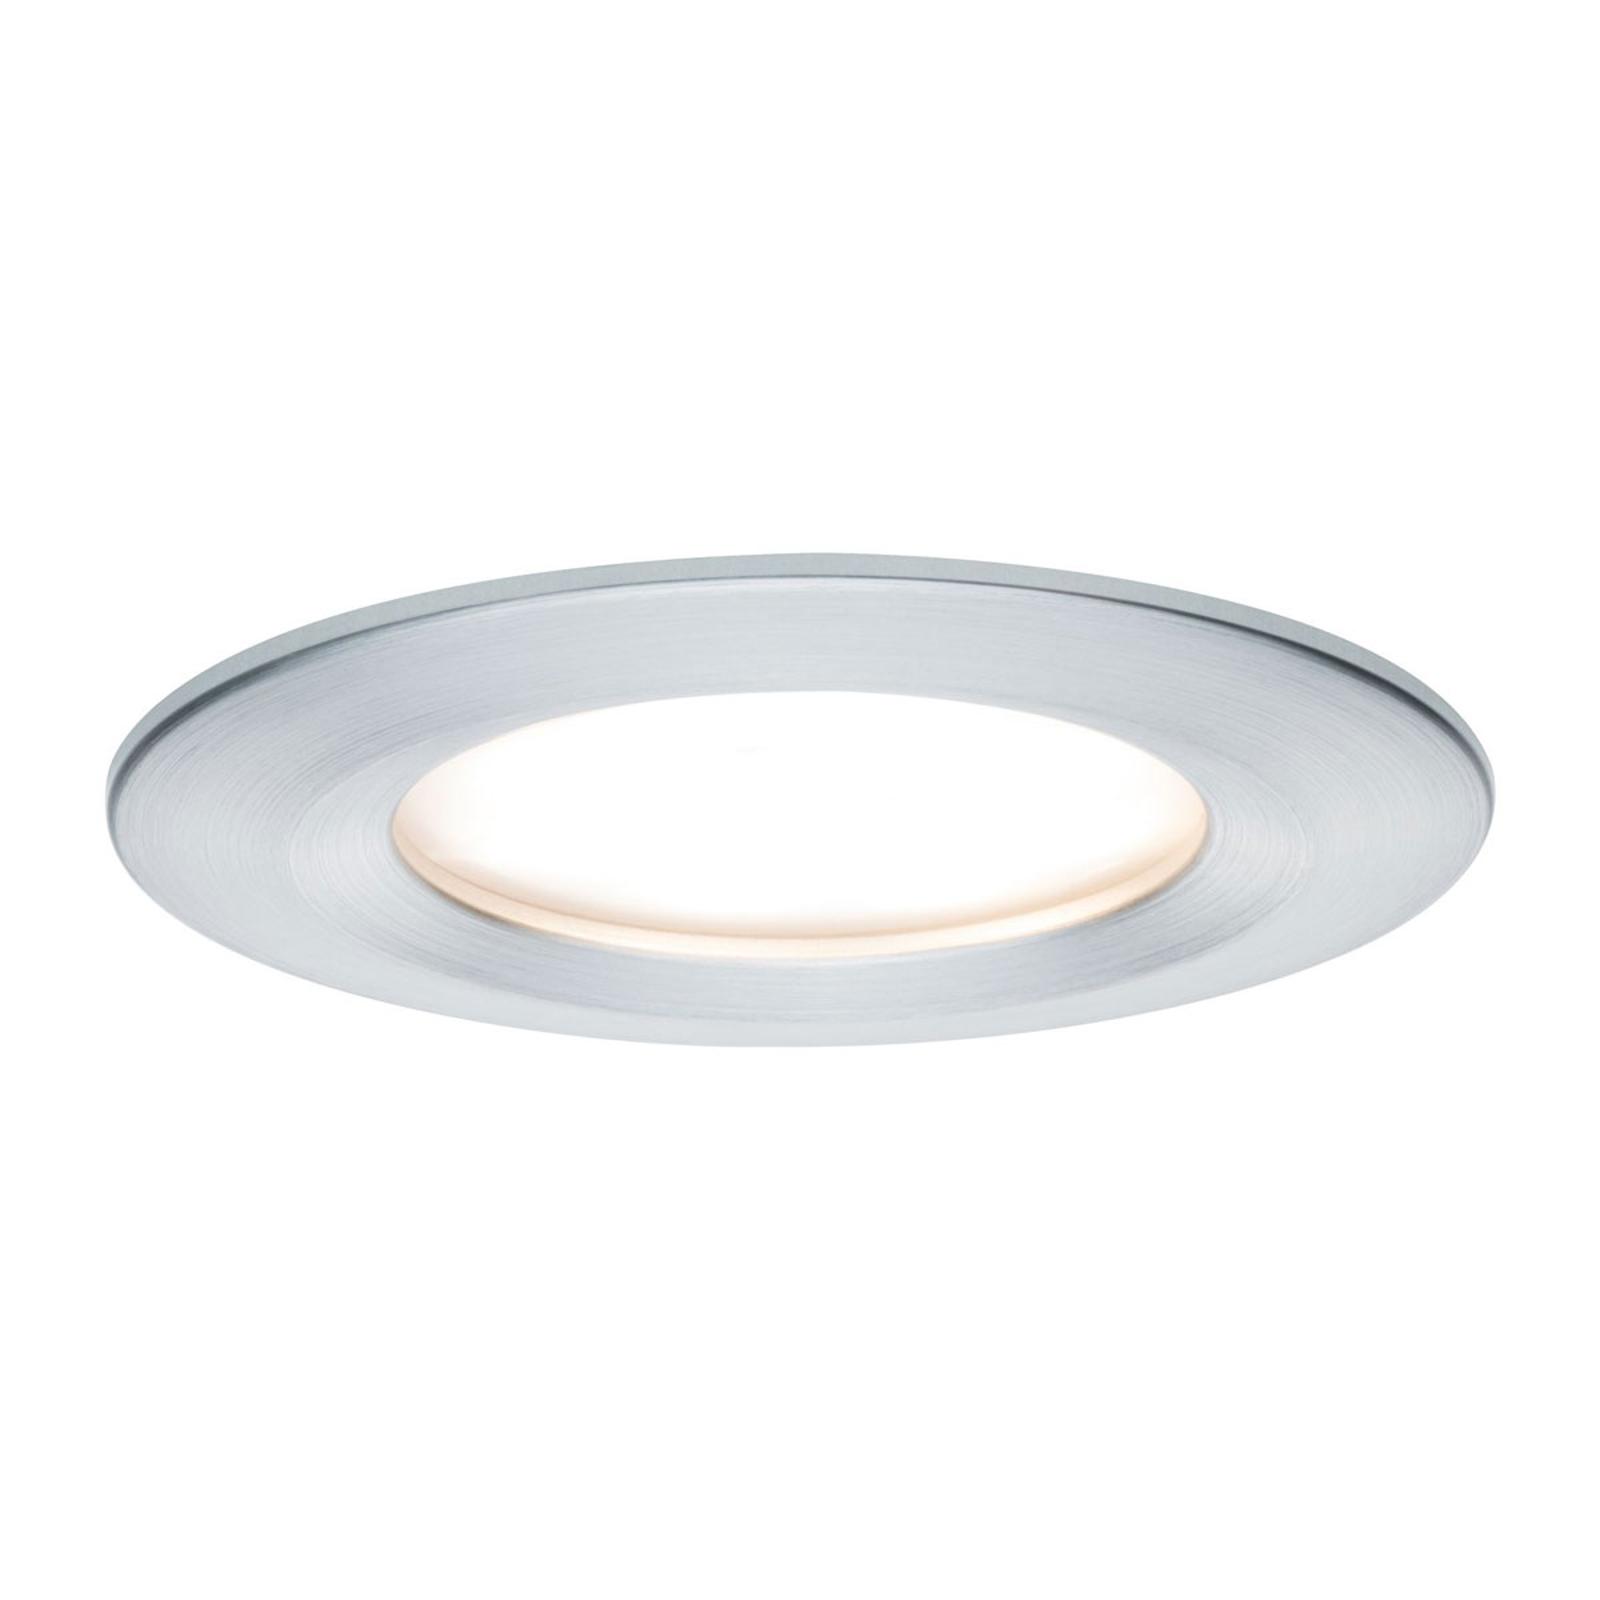 Paulmann LED-Spot Nova Coin rund, dimmbar, Alu